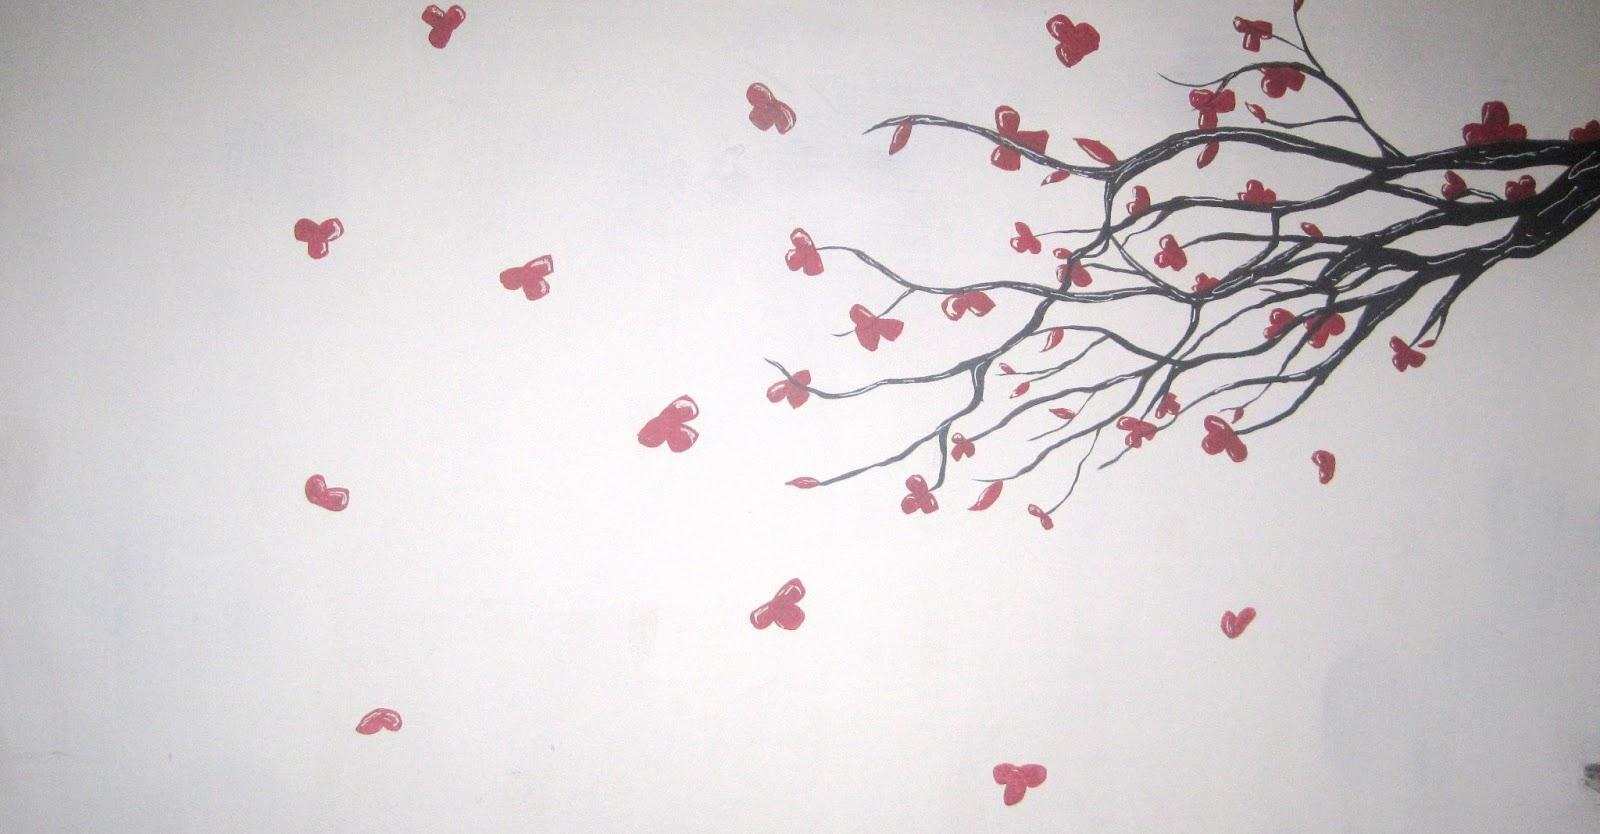 Arbol de cerezo dibujo images - Dibujos para paredes ...